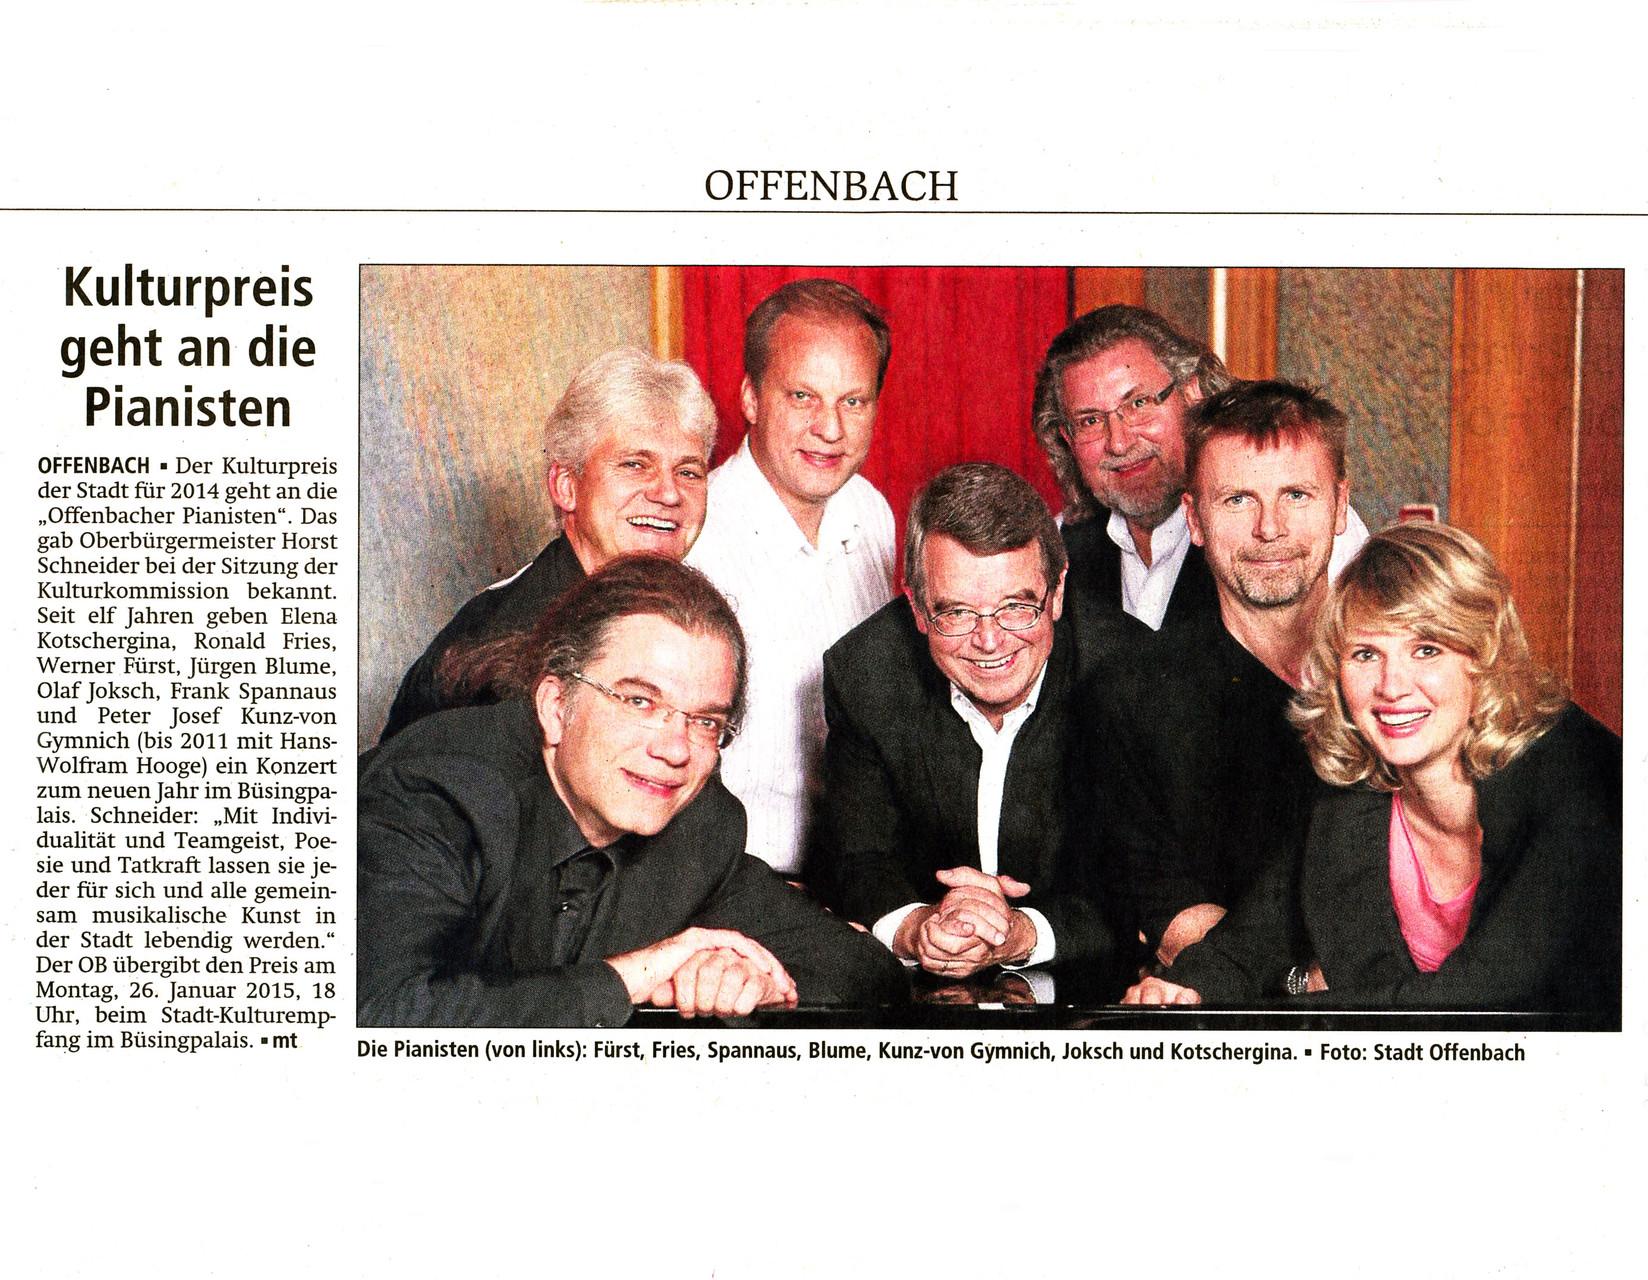 Offenbach Post, 8. November 2014